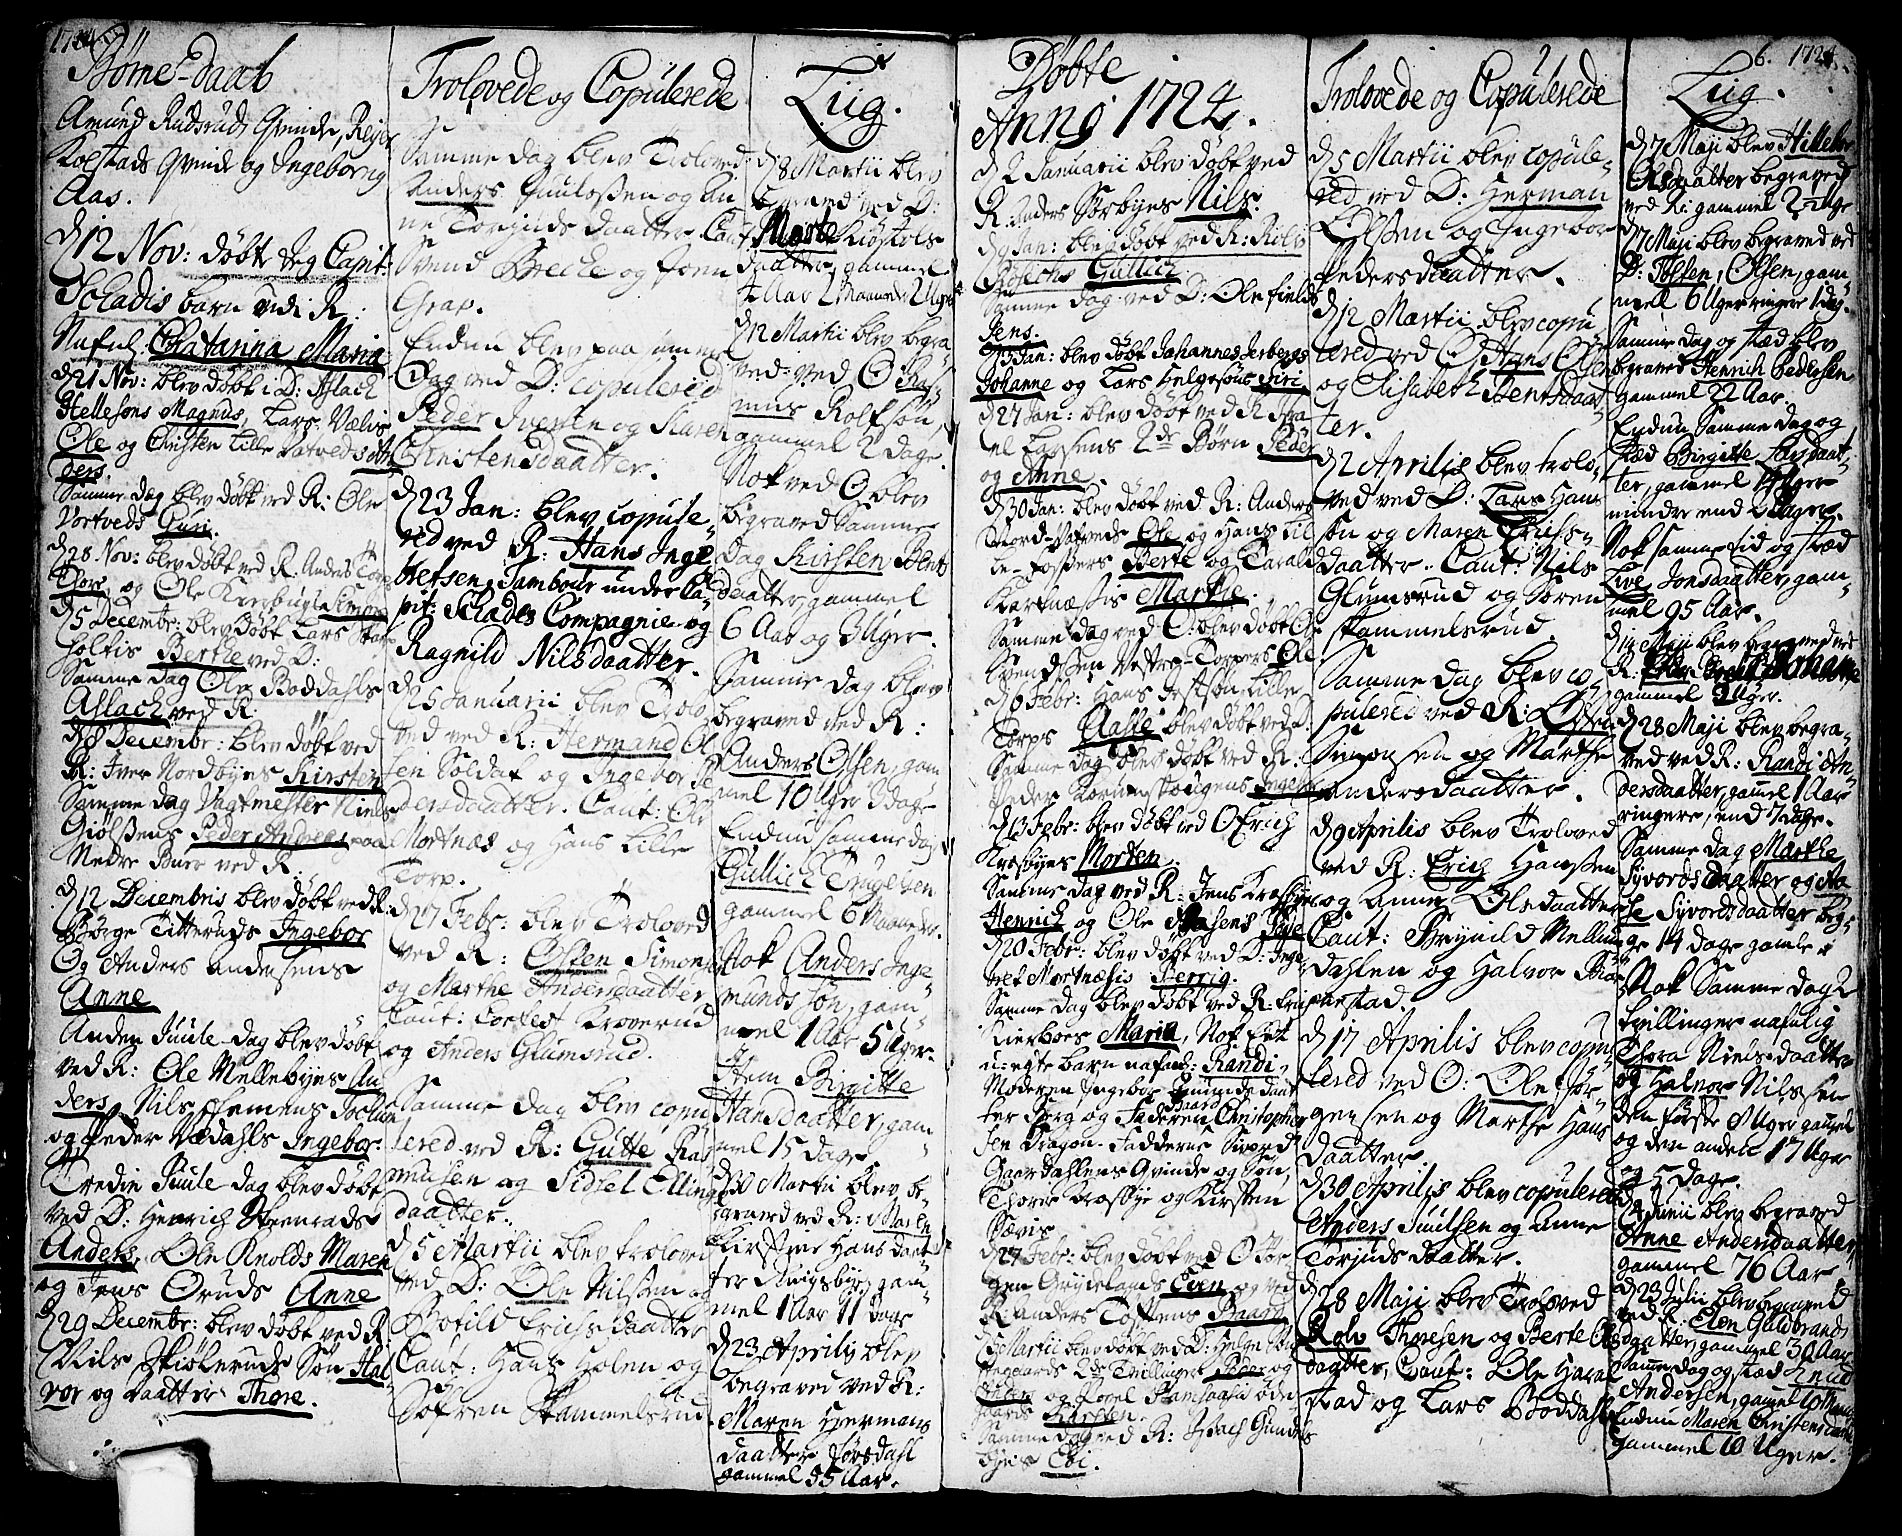 SAO, Rakkestad prestekontor Kirkebøker, F/Fa/L0001: Ministerialbok nr. I 1, 1722-1740, s. 6